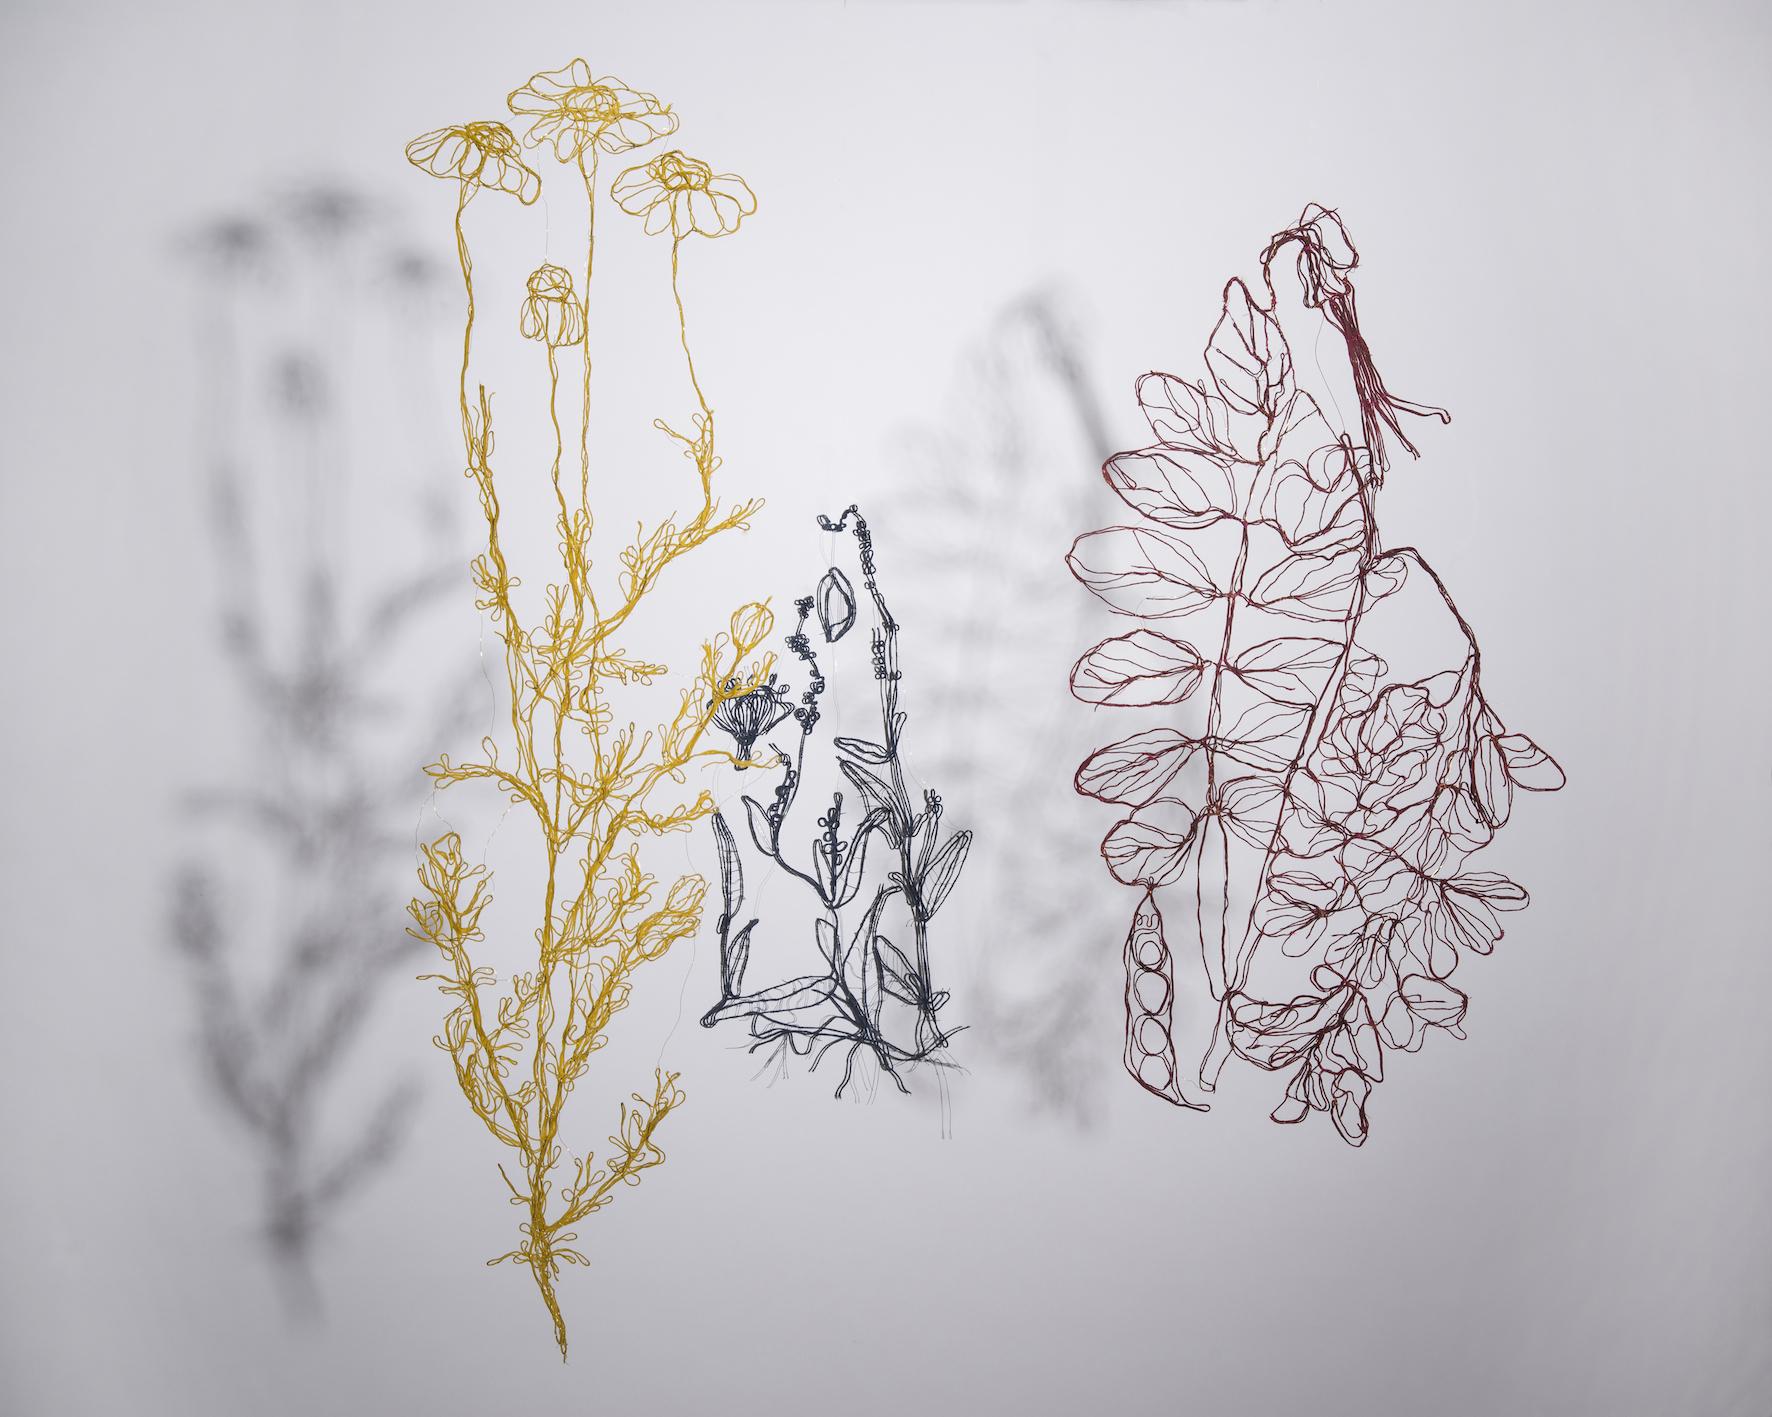 Botanica_022